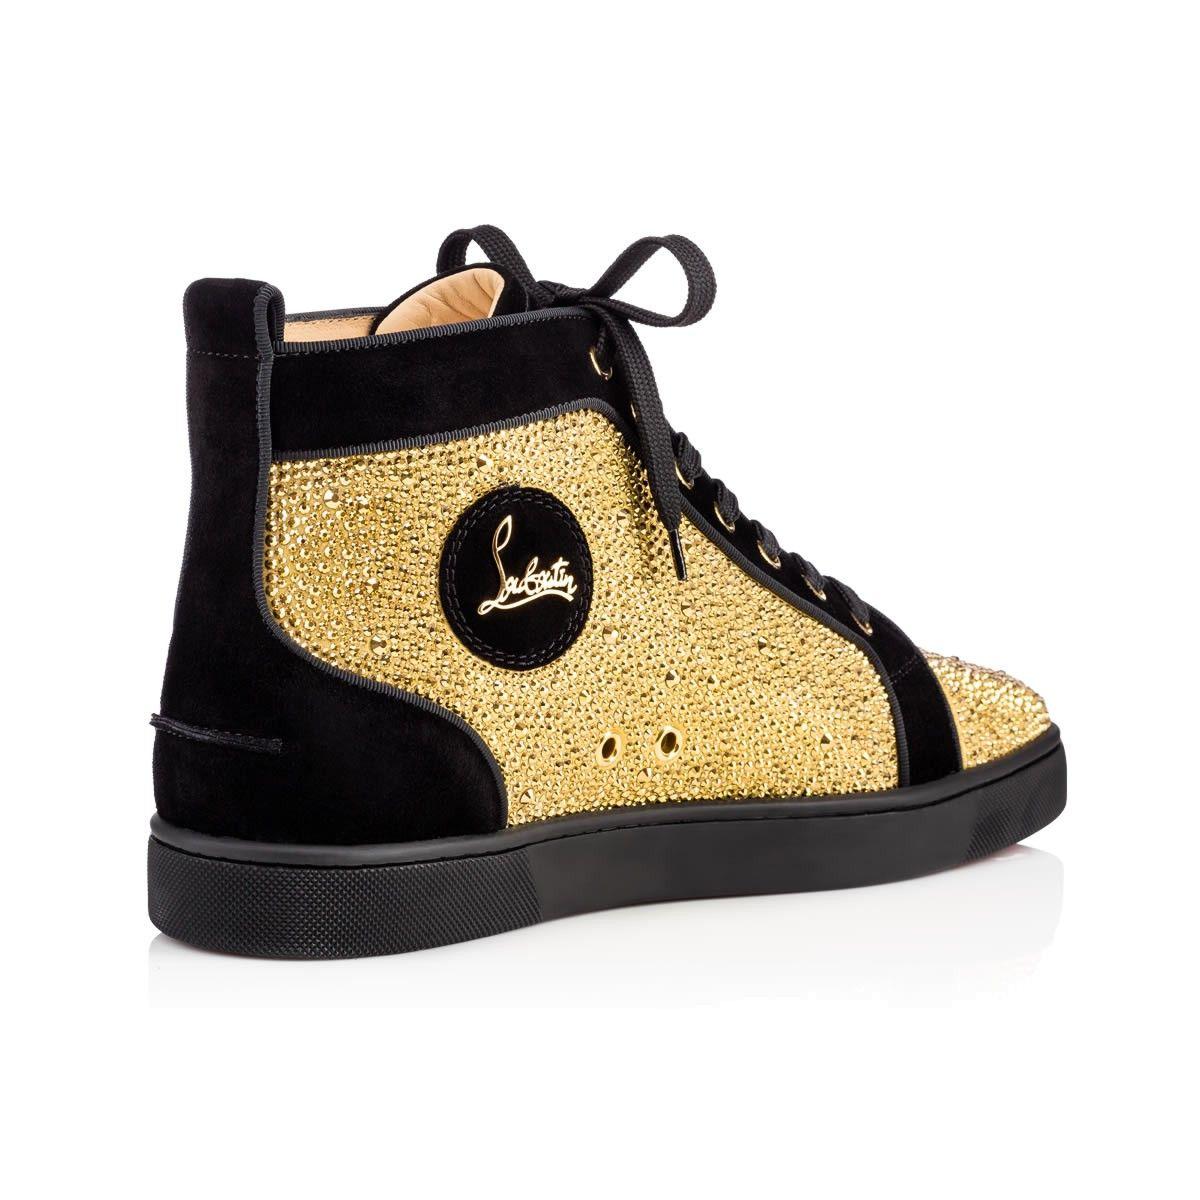 Louis Strass Men's Flat Atlantic Strass - Men Shoes - Christian Louboutin